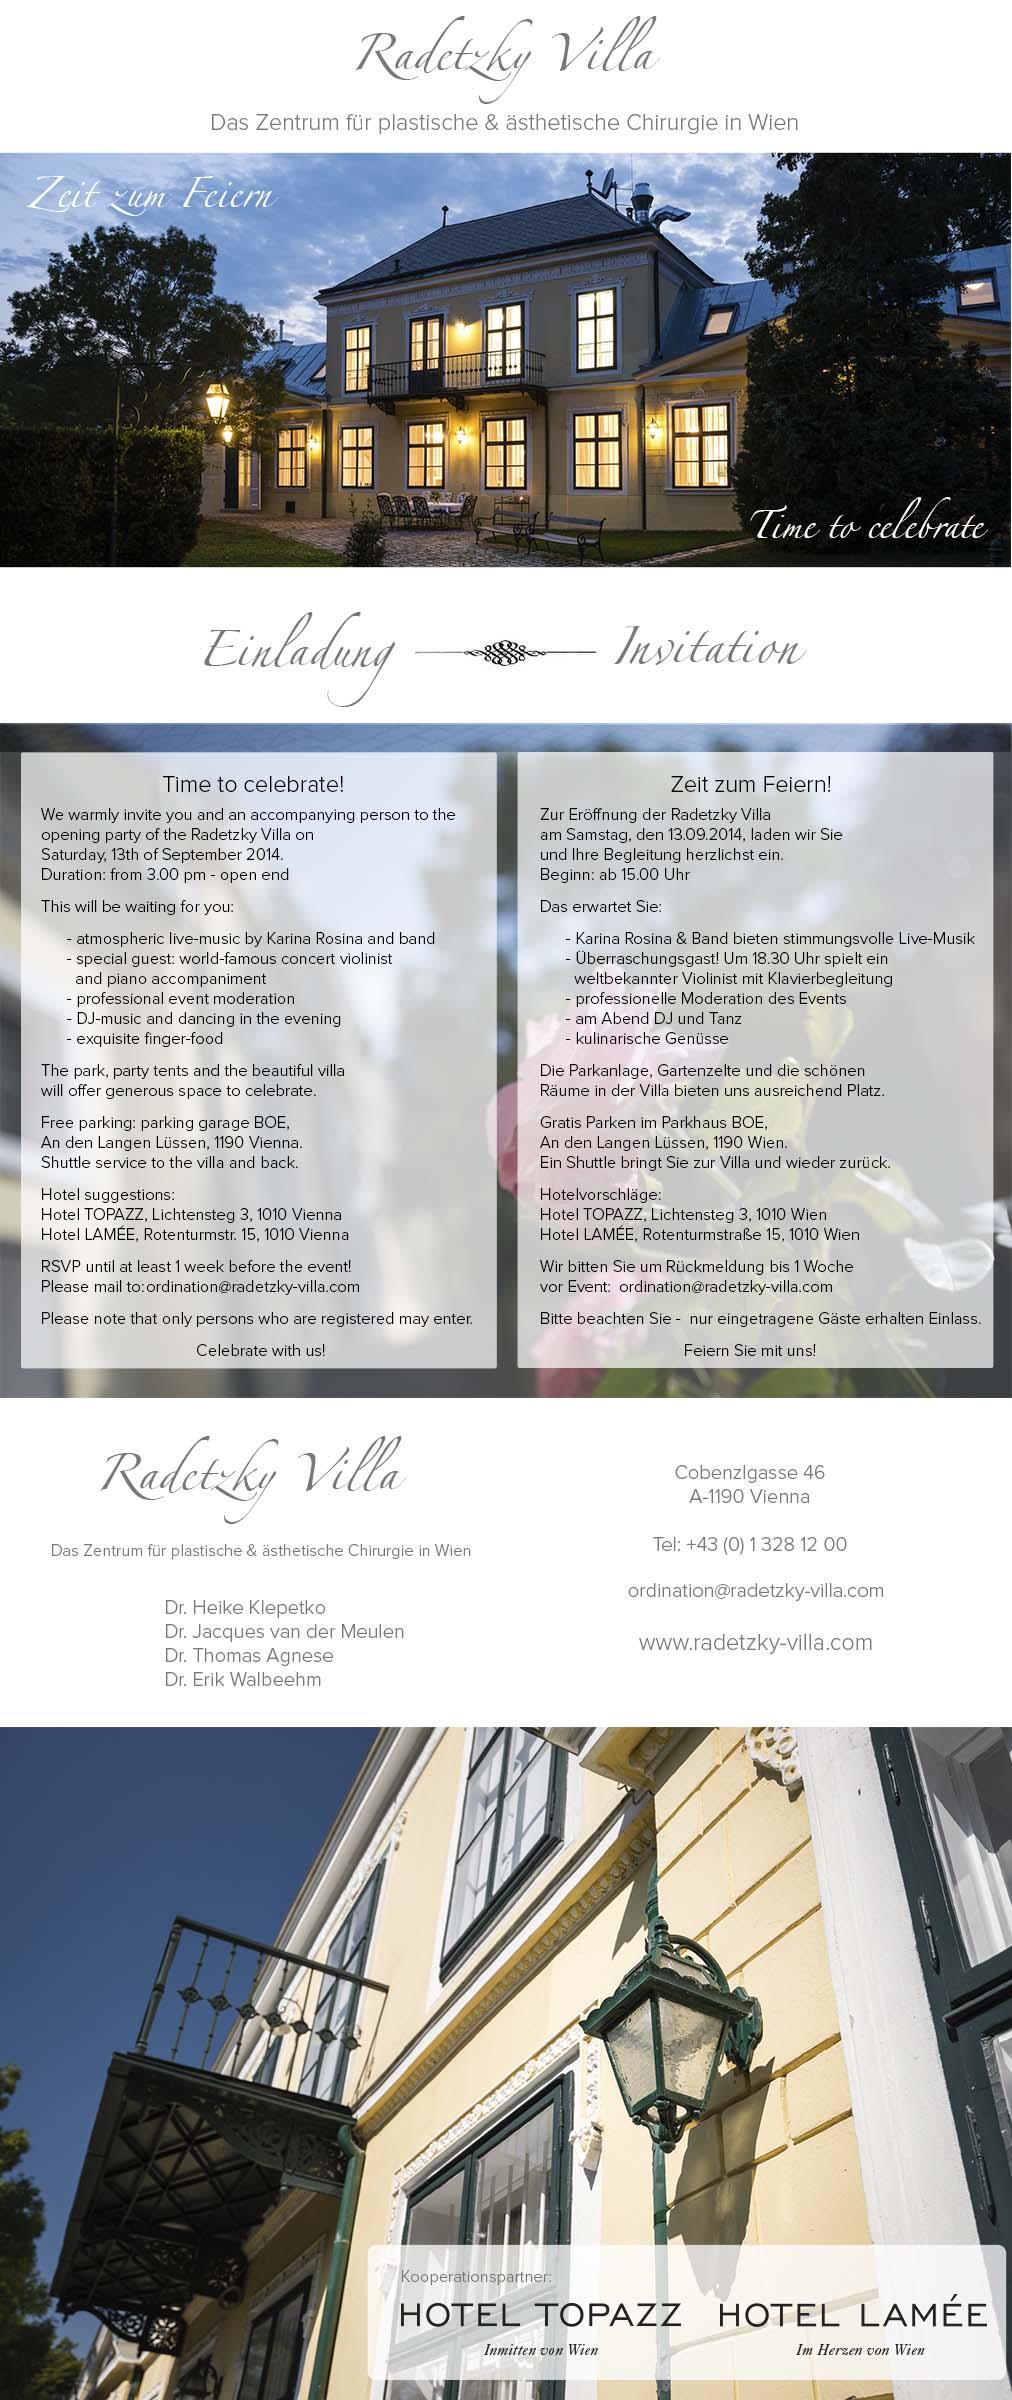 Einladung_Radetzky Villa_13.09.2014